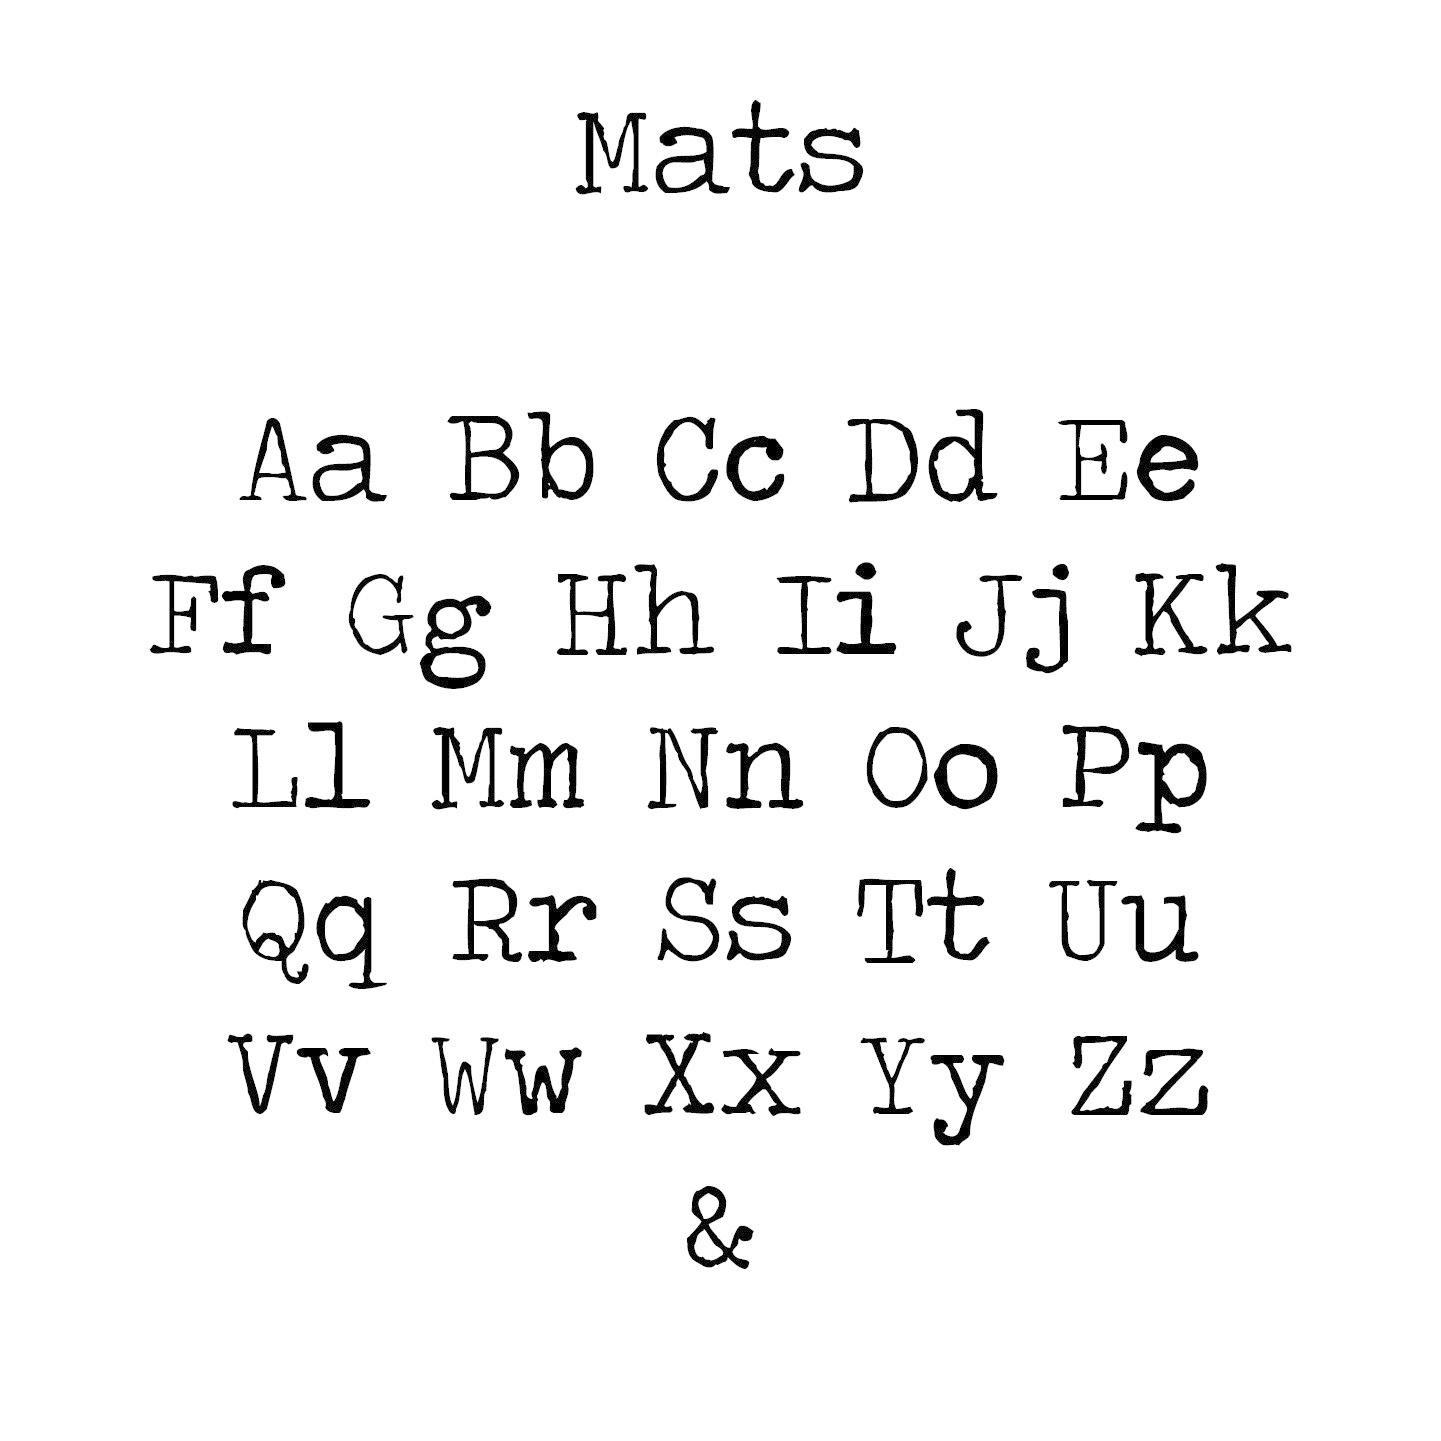 Houten tekst lettertype Mats